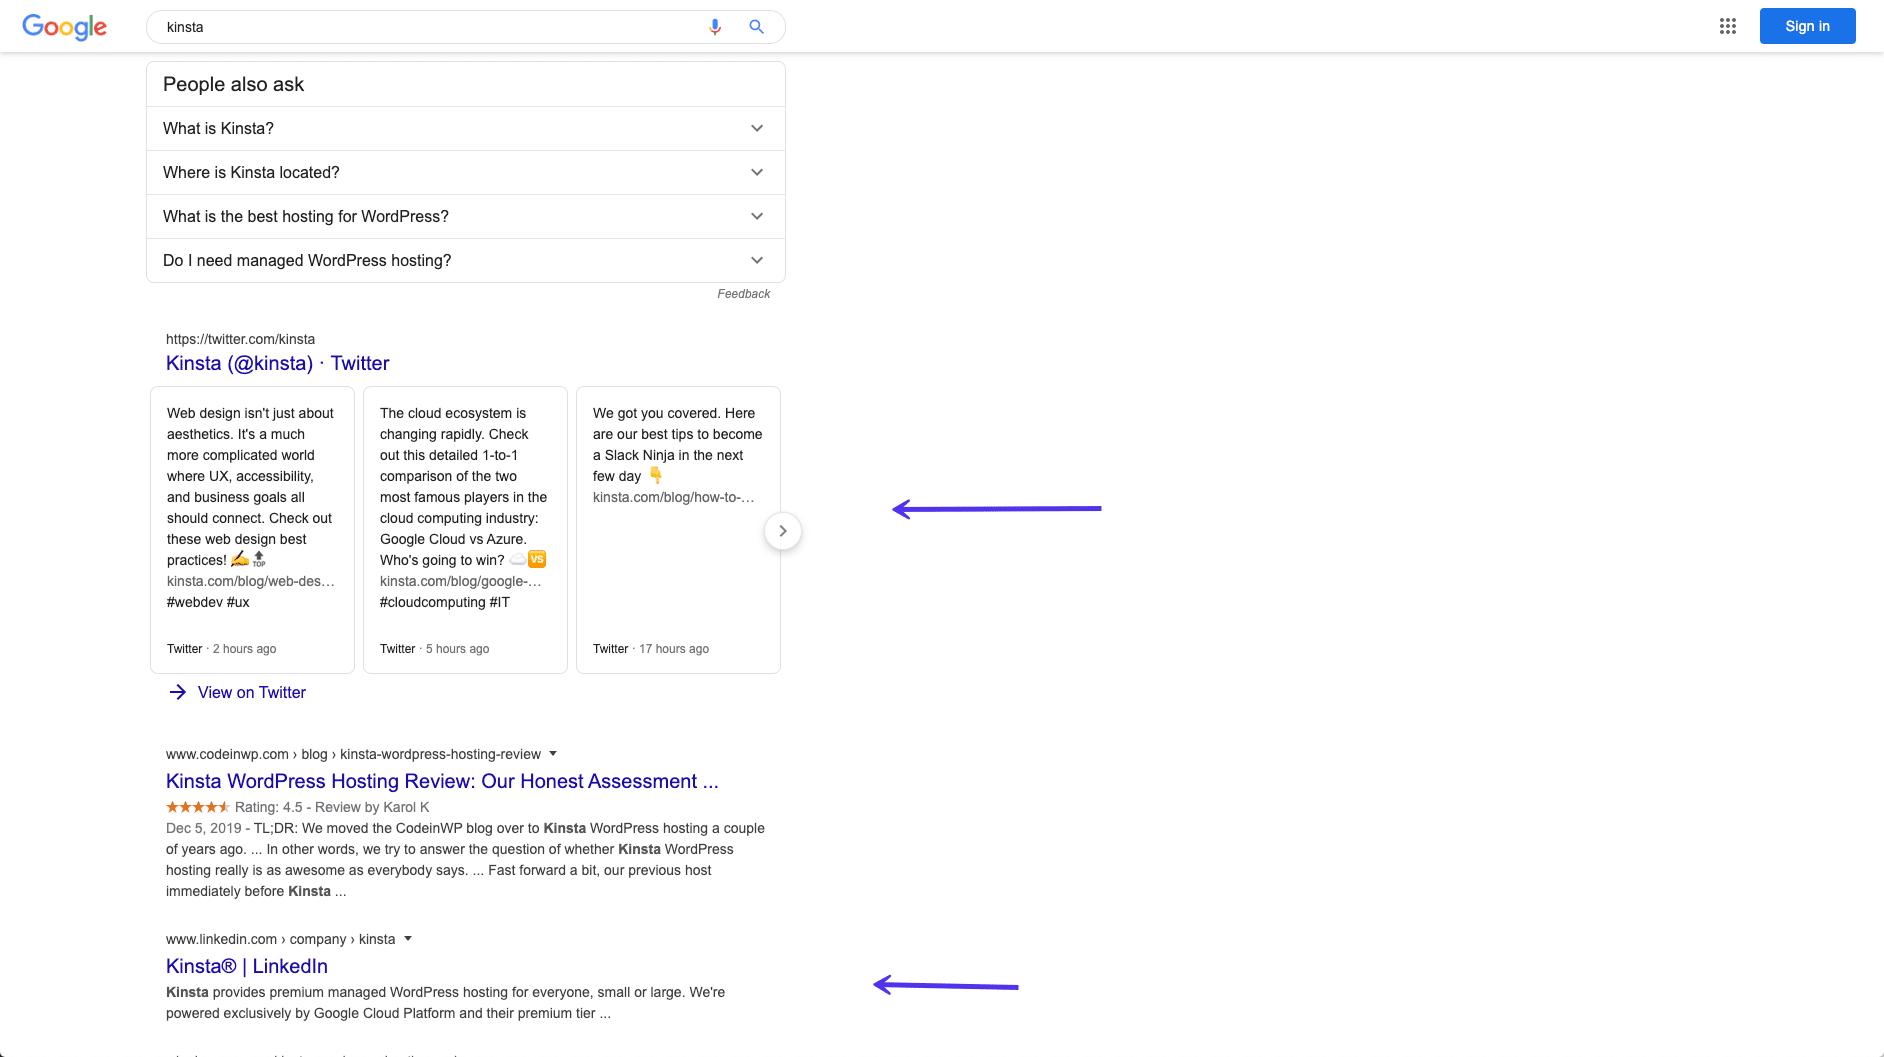 Rankings von Kinsta's Social-Media-Profilen in Google